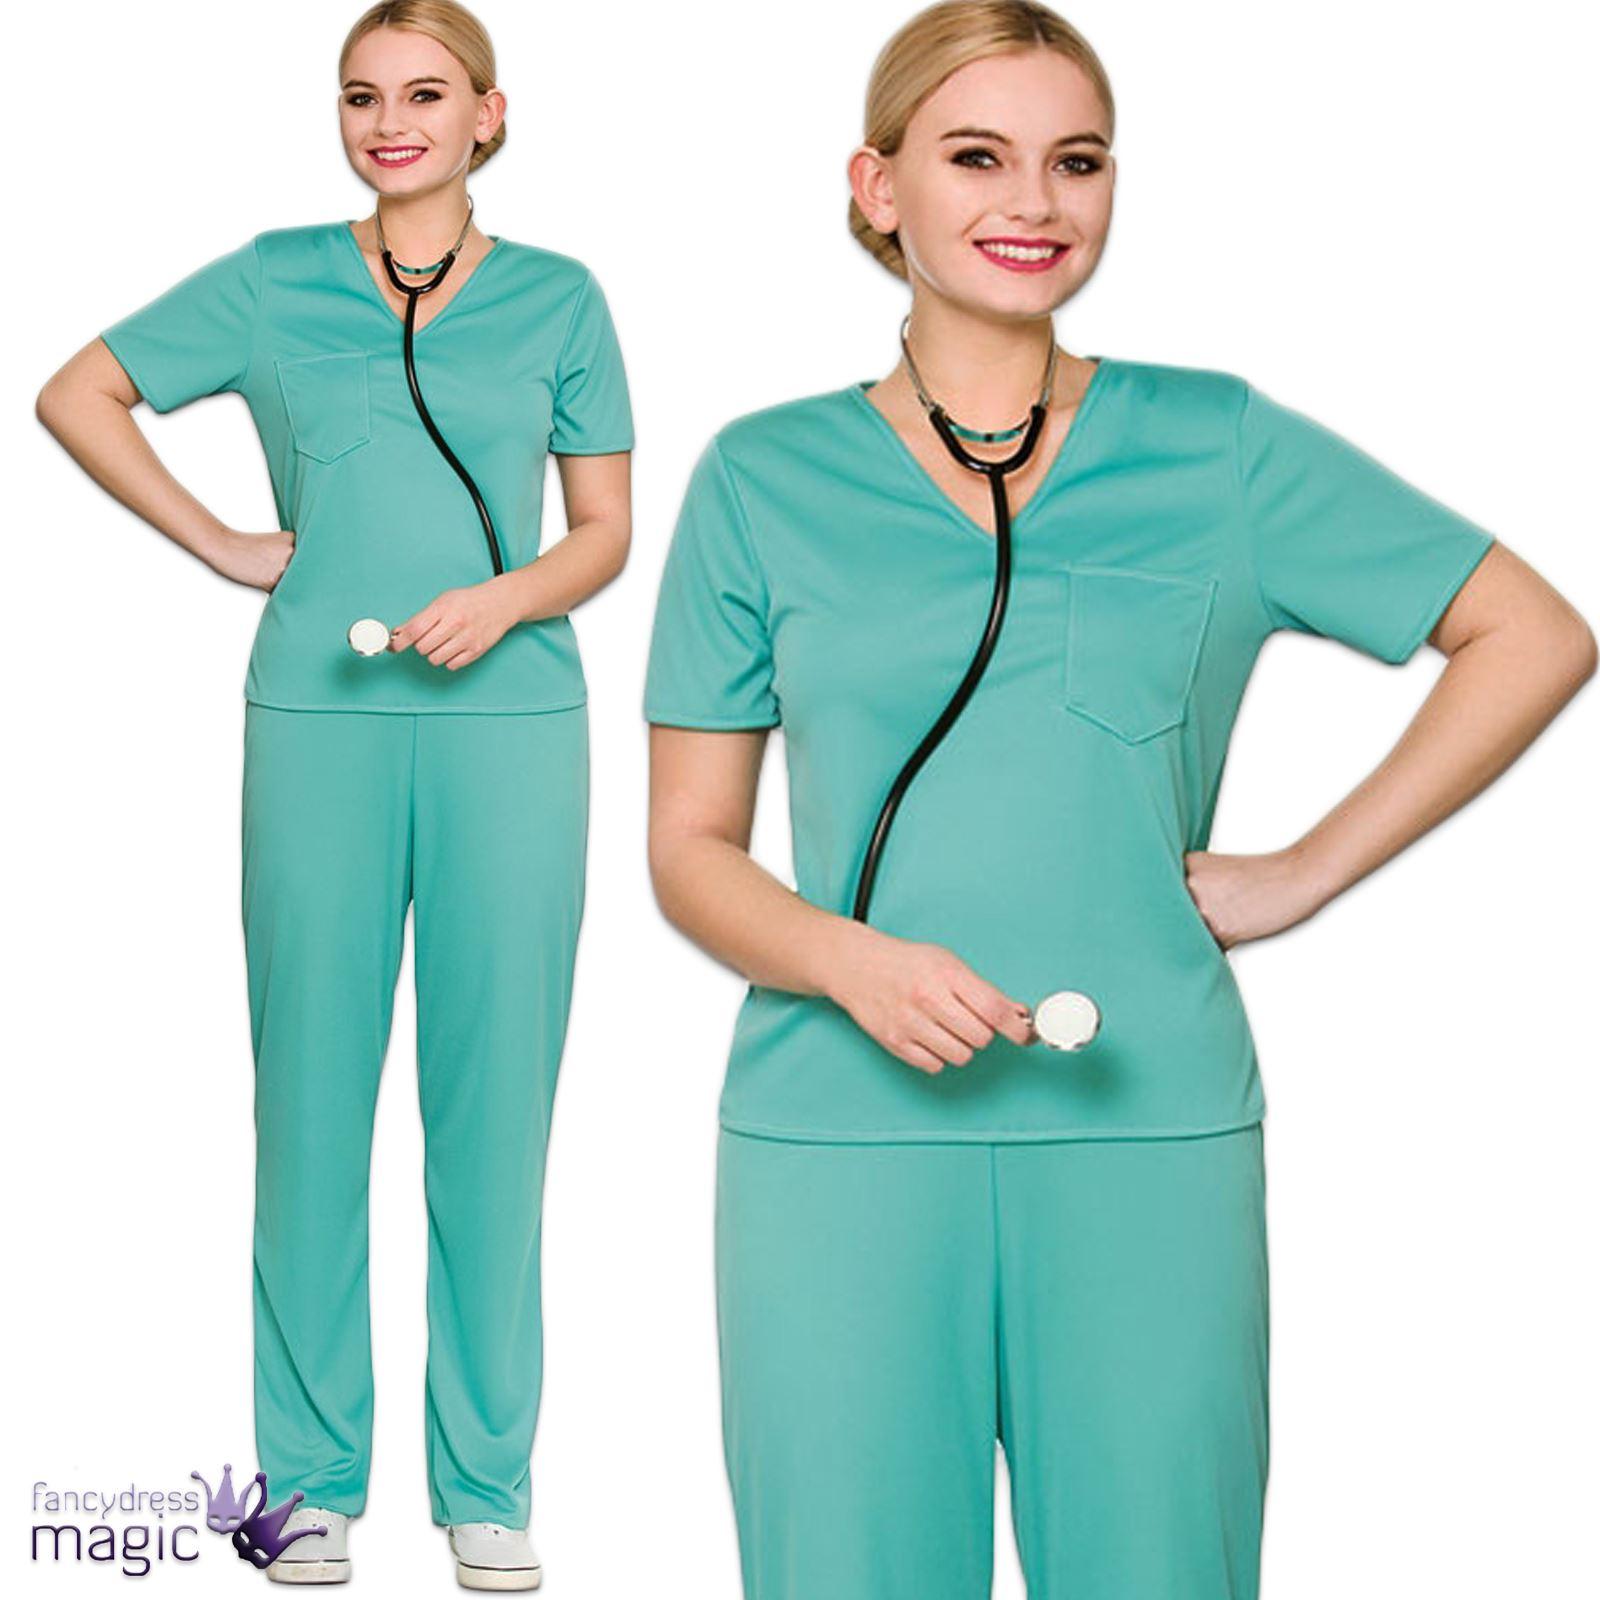 85fad049e82 Ladies Adults ER Scrubs Doctor Surgeon Hospital Nurse Fancy Dress Costume  Outfit Sc 1 St EBay